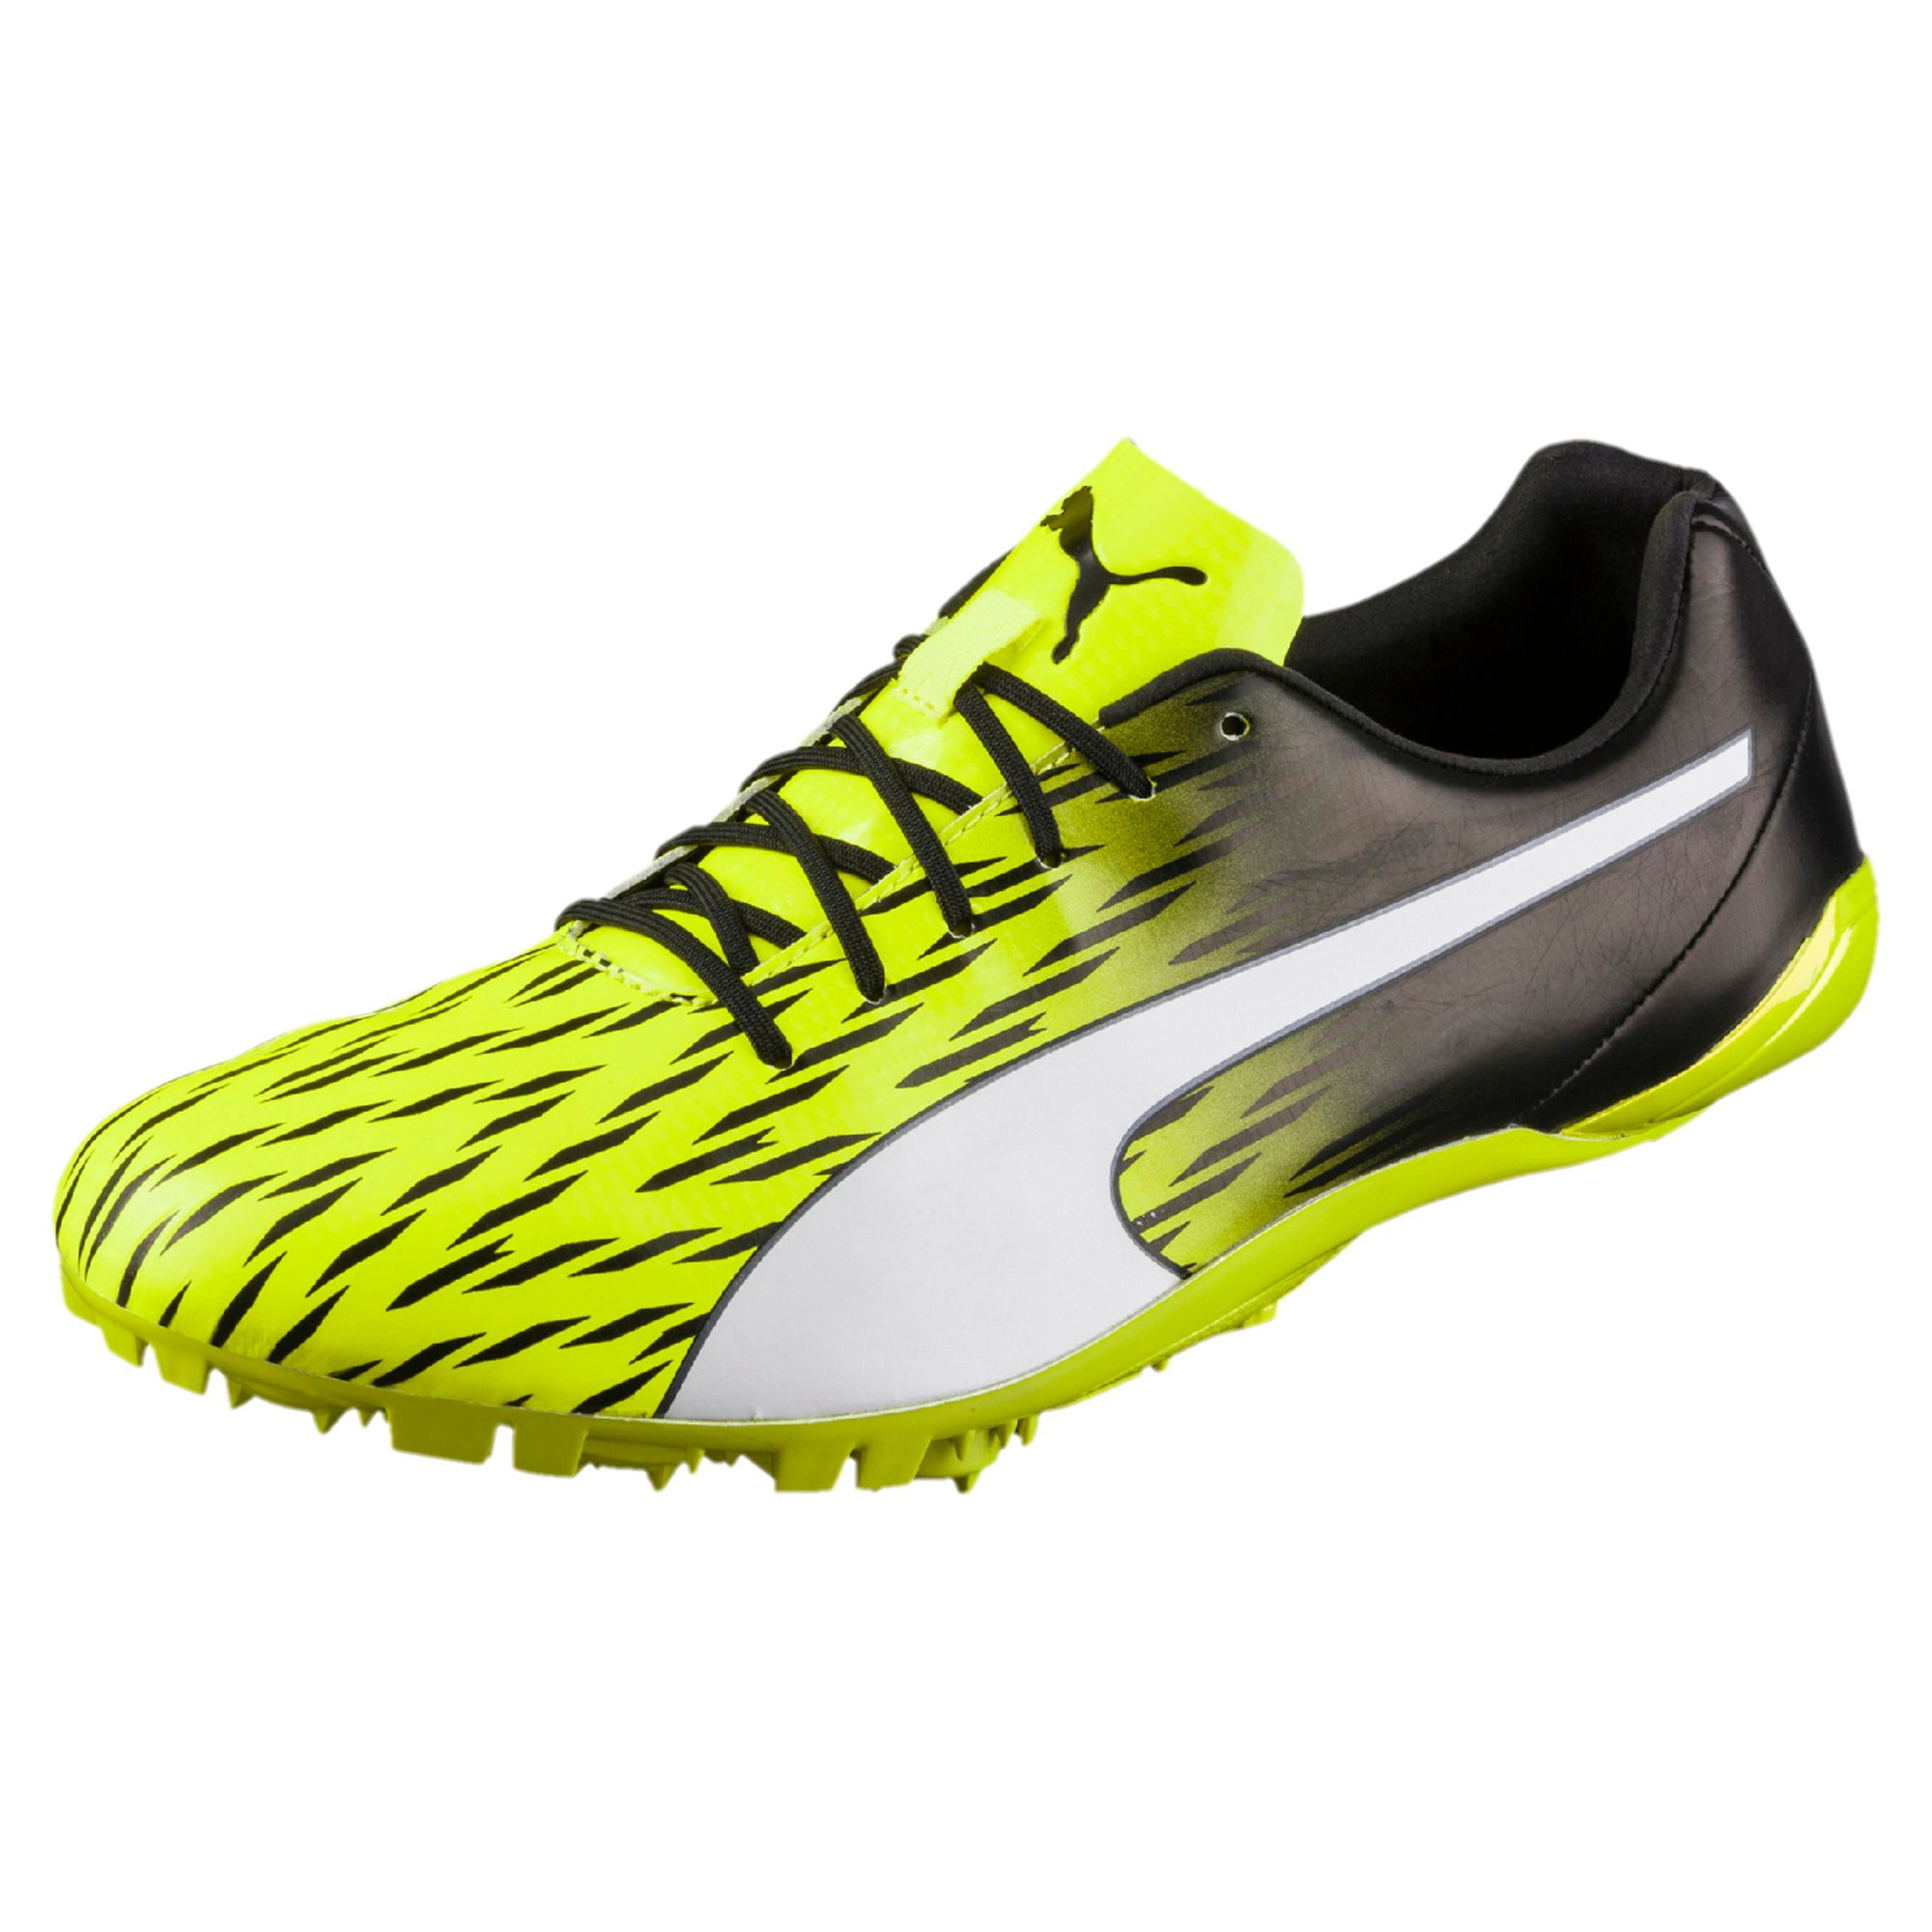 evoSPEED Electric 5 обувь